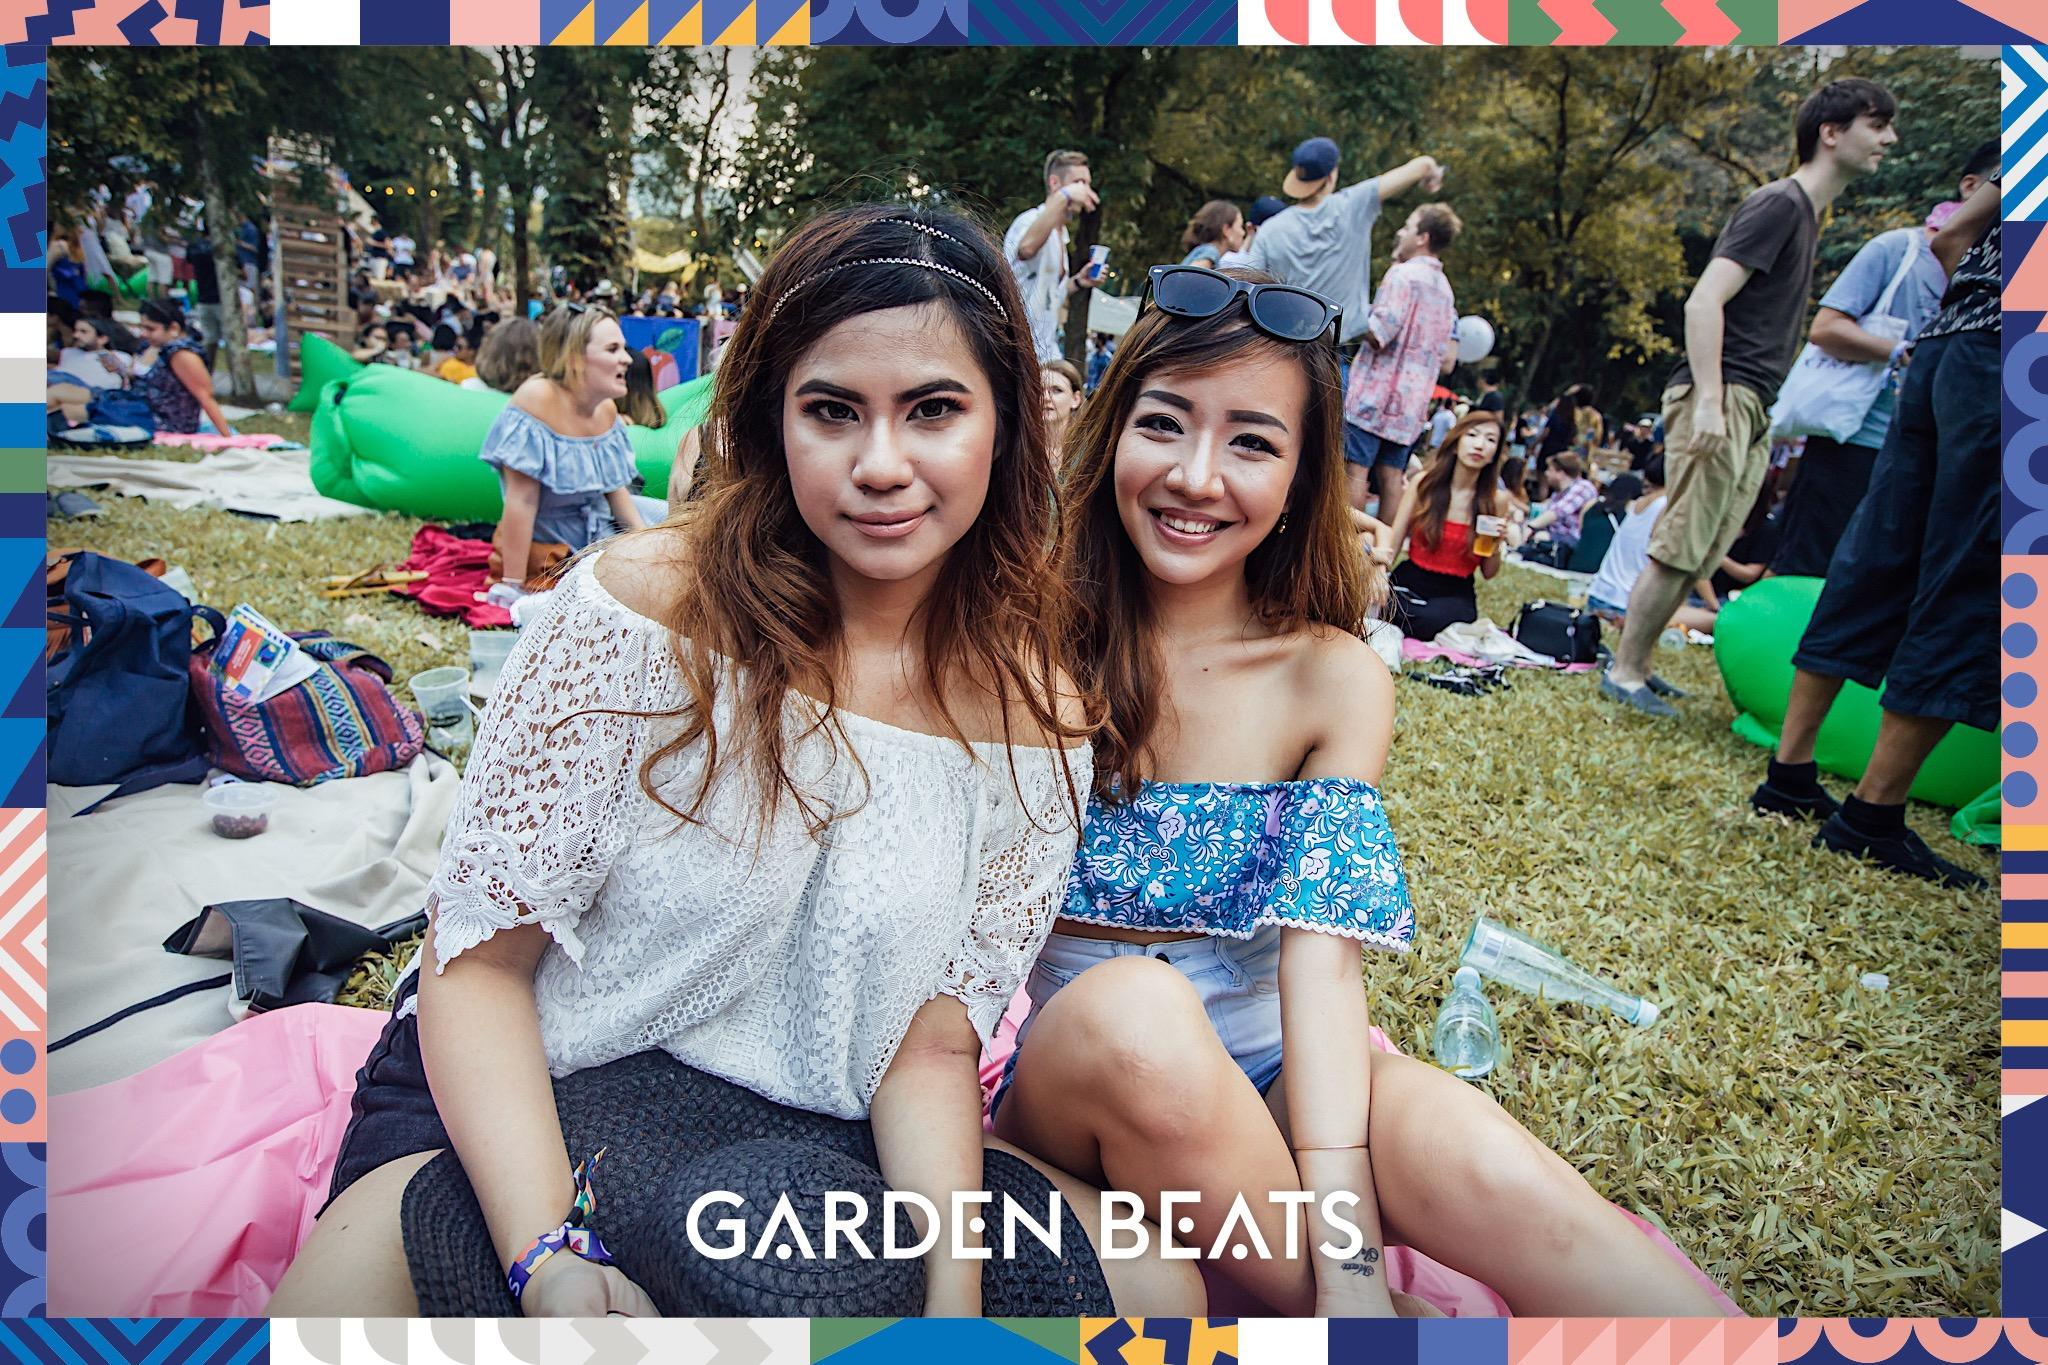 18032017_GardenBeats_Colossal573_WatermarkedGB.jpg